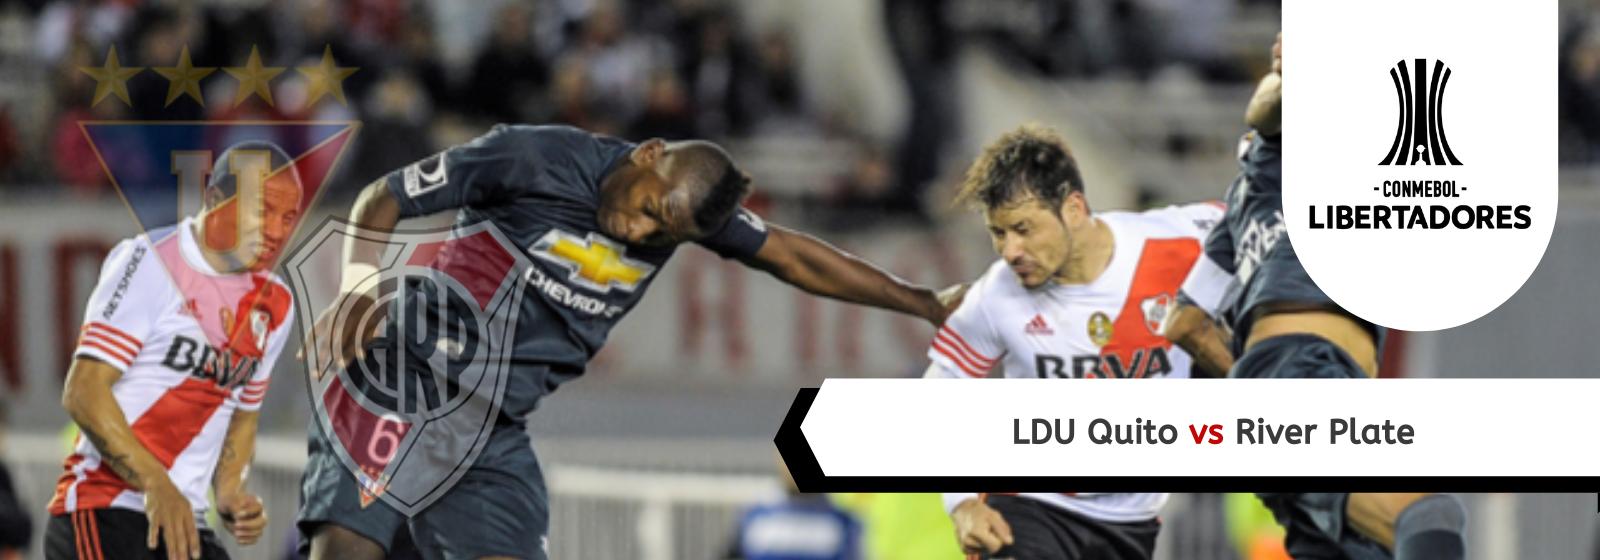 Asianconnect: LDU Quito (Ecuador) vs River Plate (Argentina) Odds for March 4, 2020